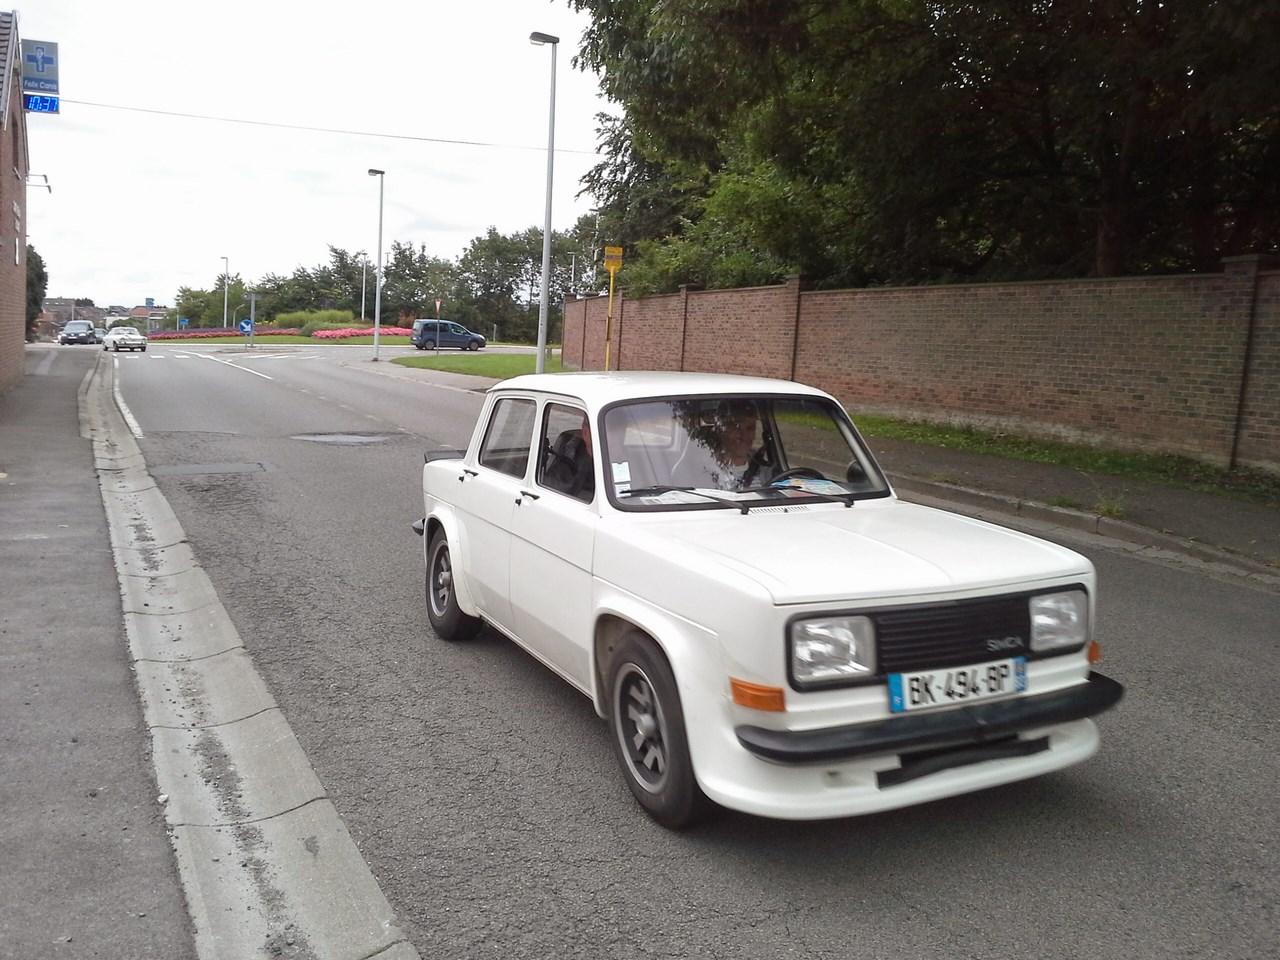 Dalhem - Stavelot - Francorchamps